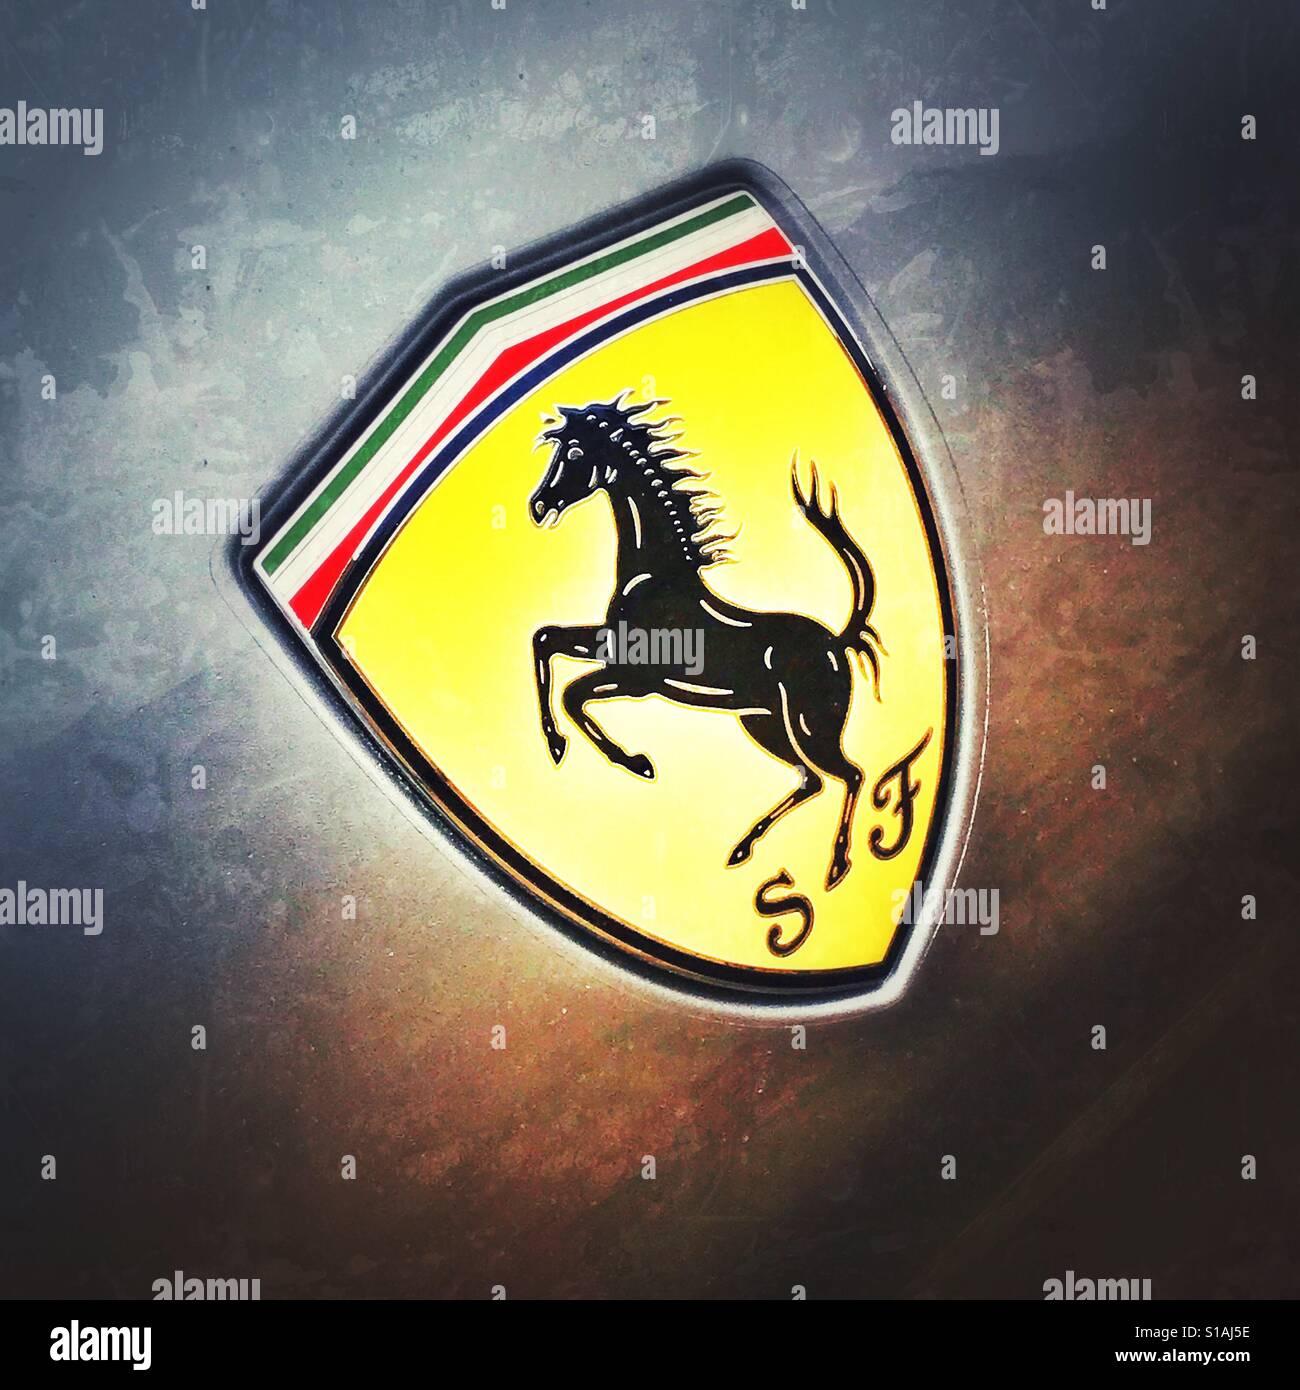 A Ferrari Logo Stock Photo 310635066 Alamy